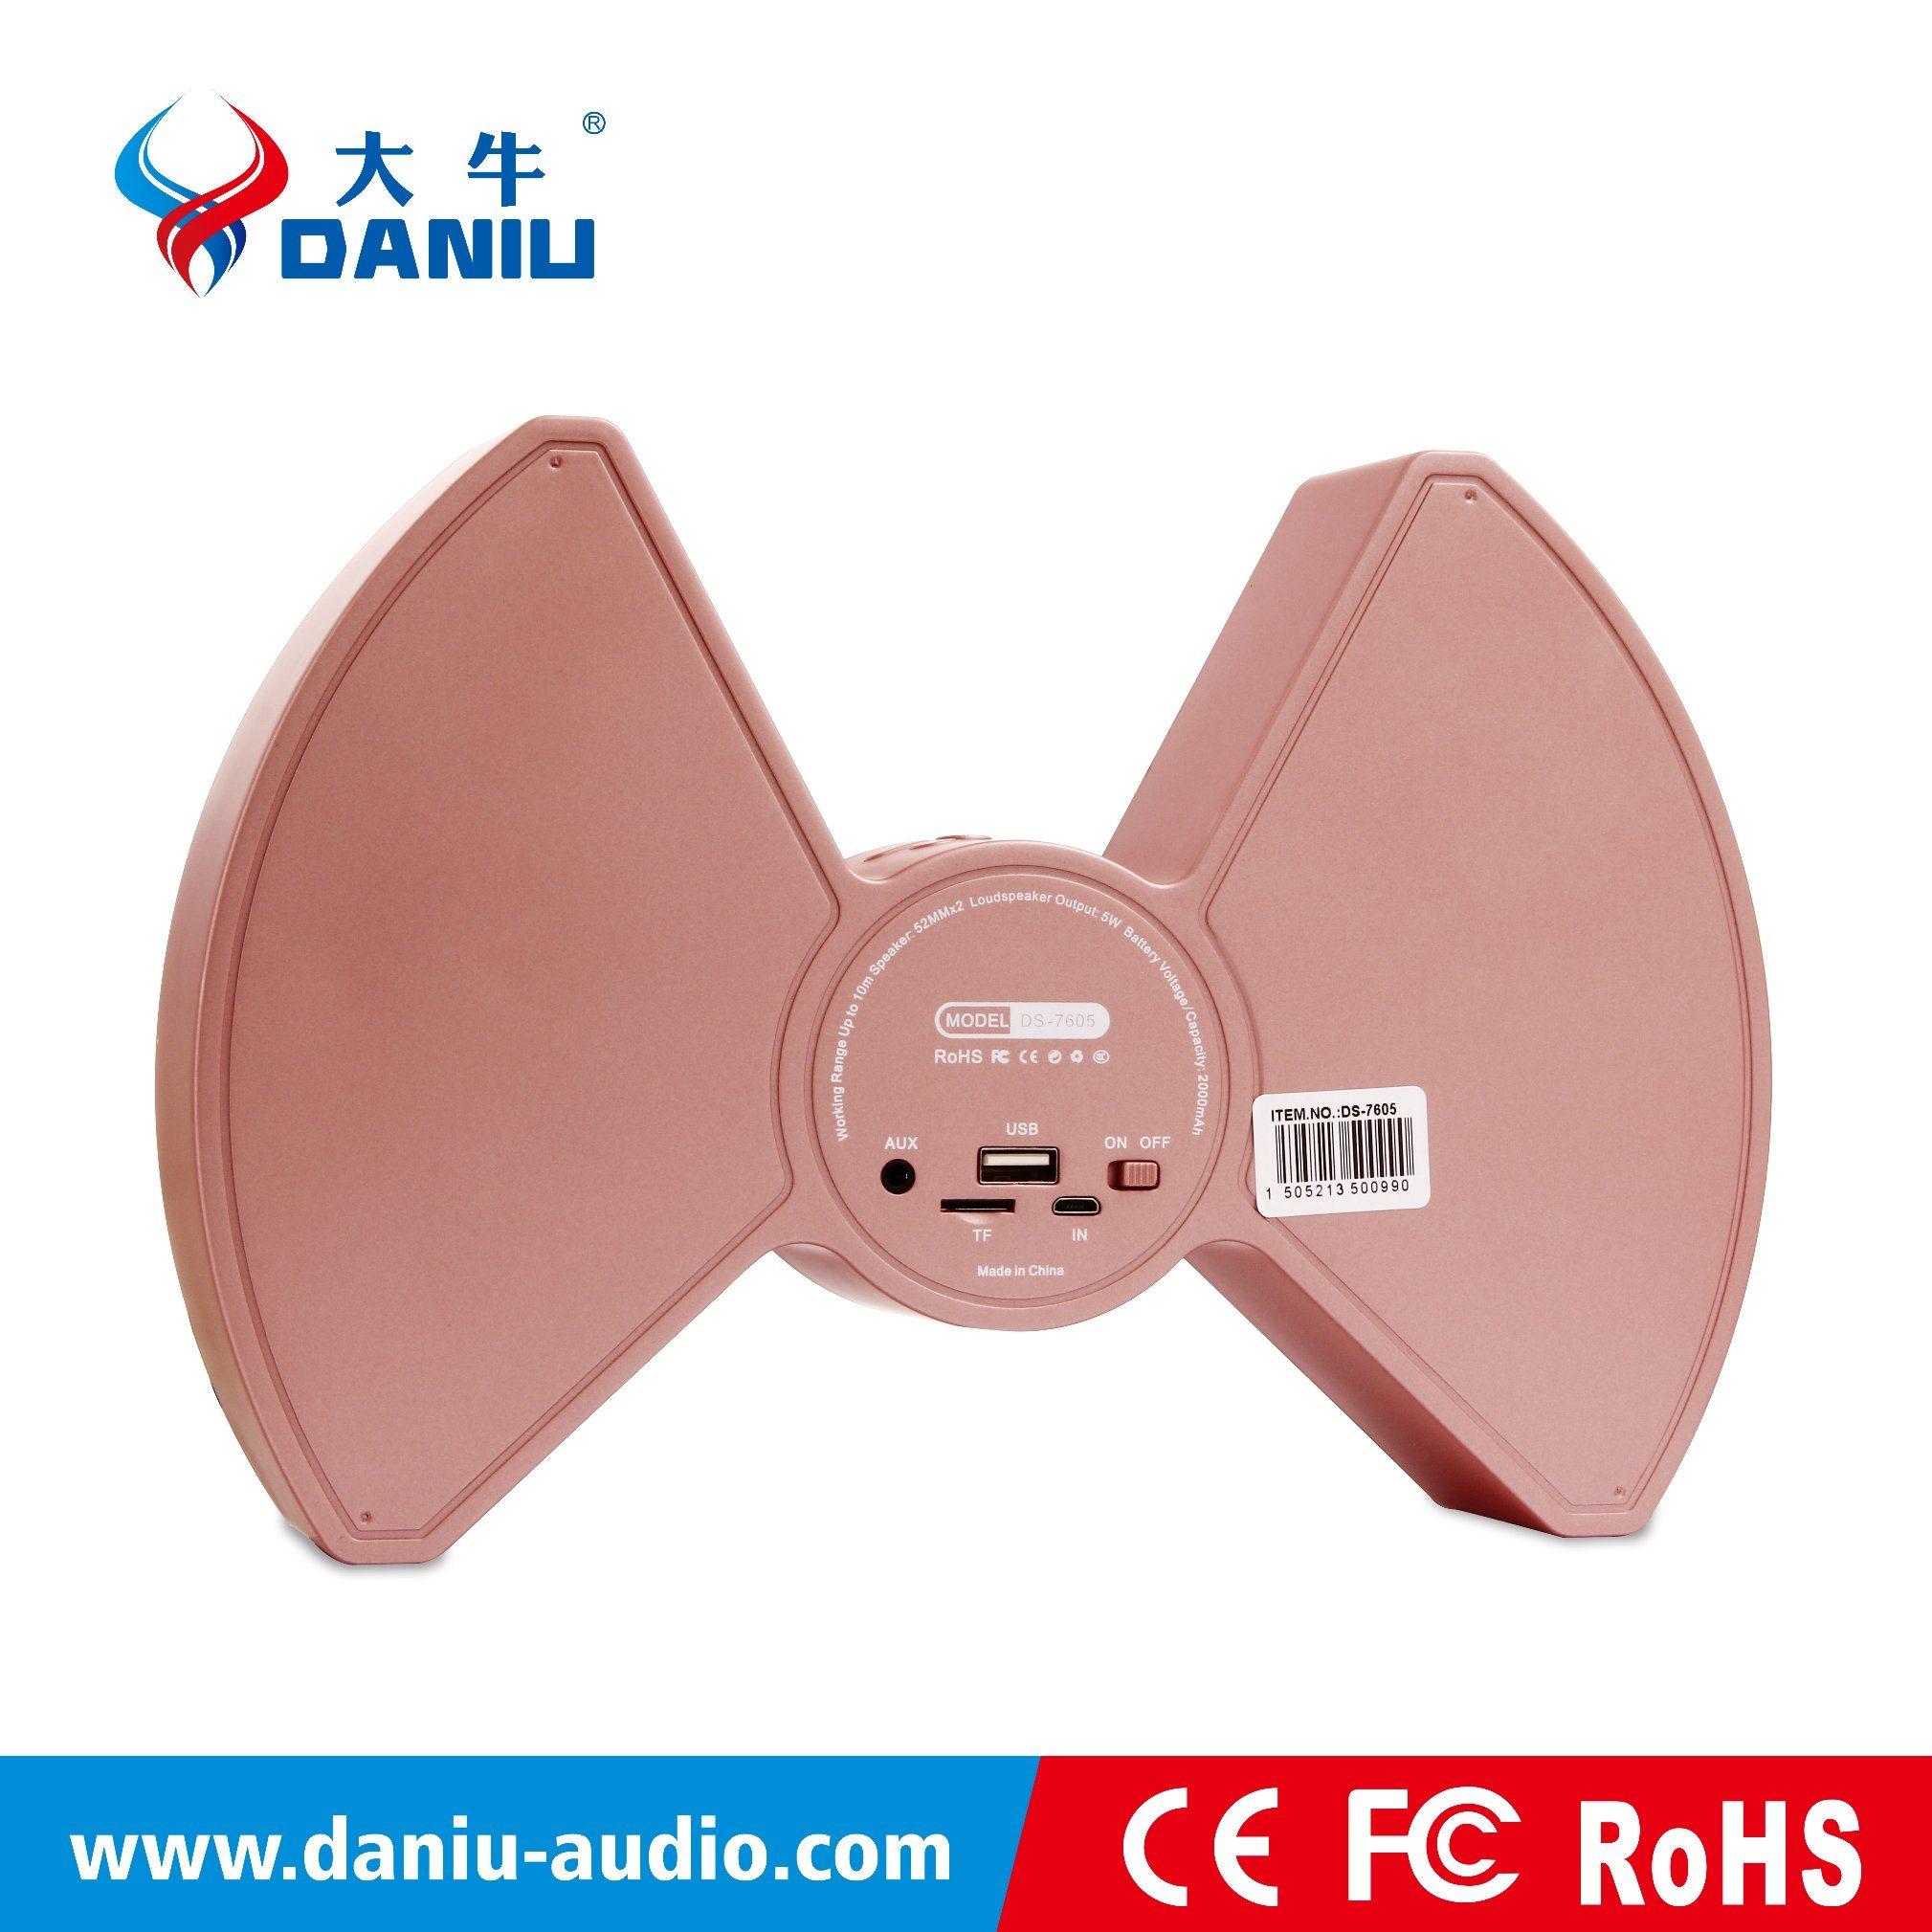 2016 New Hot Selling Multi-Function Bluetooth Speaker with Powerbank+Clock Display+Alarm Clock